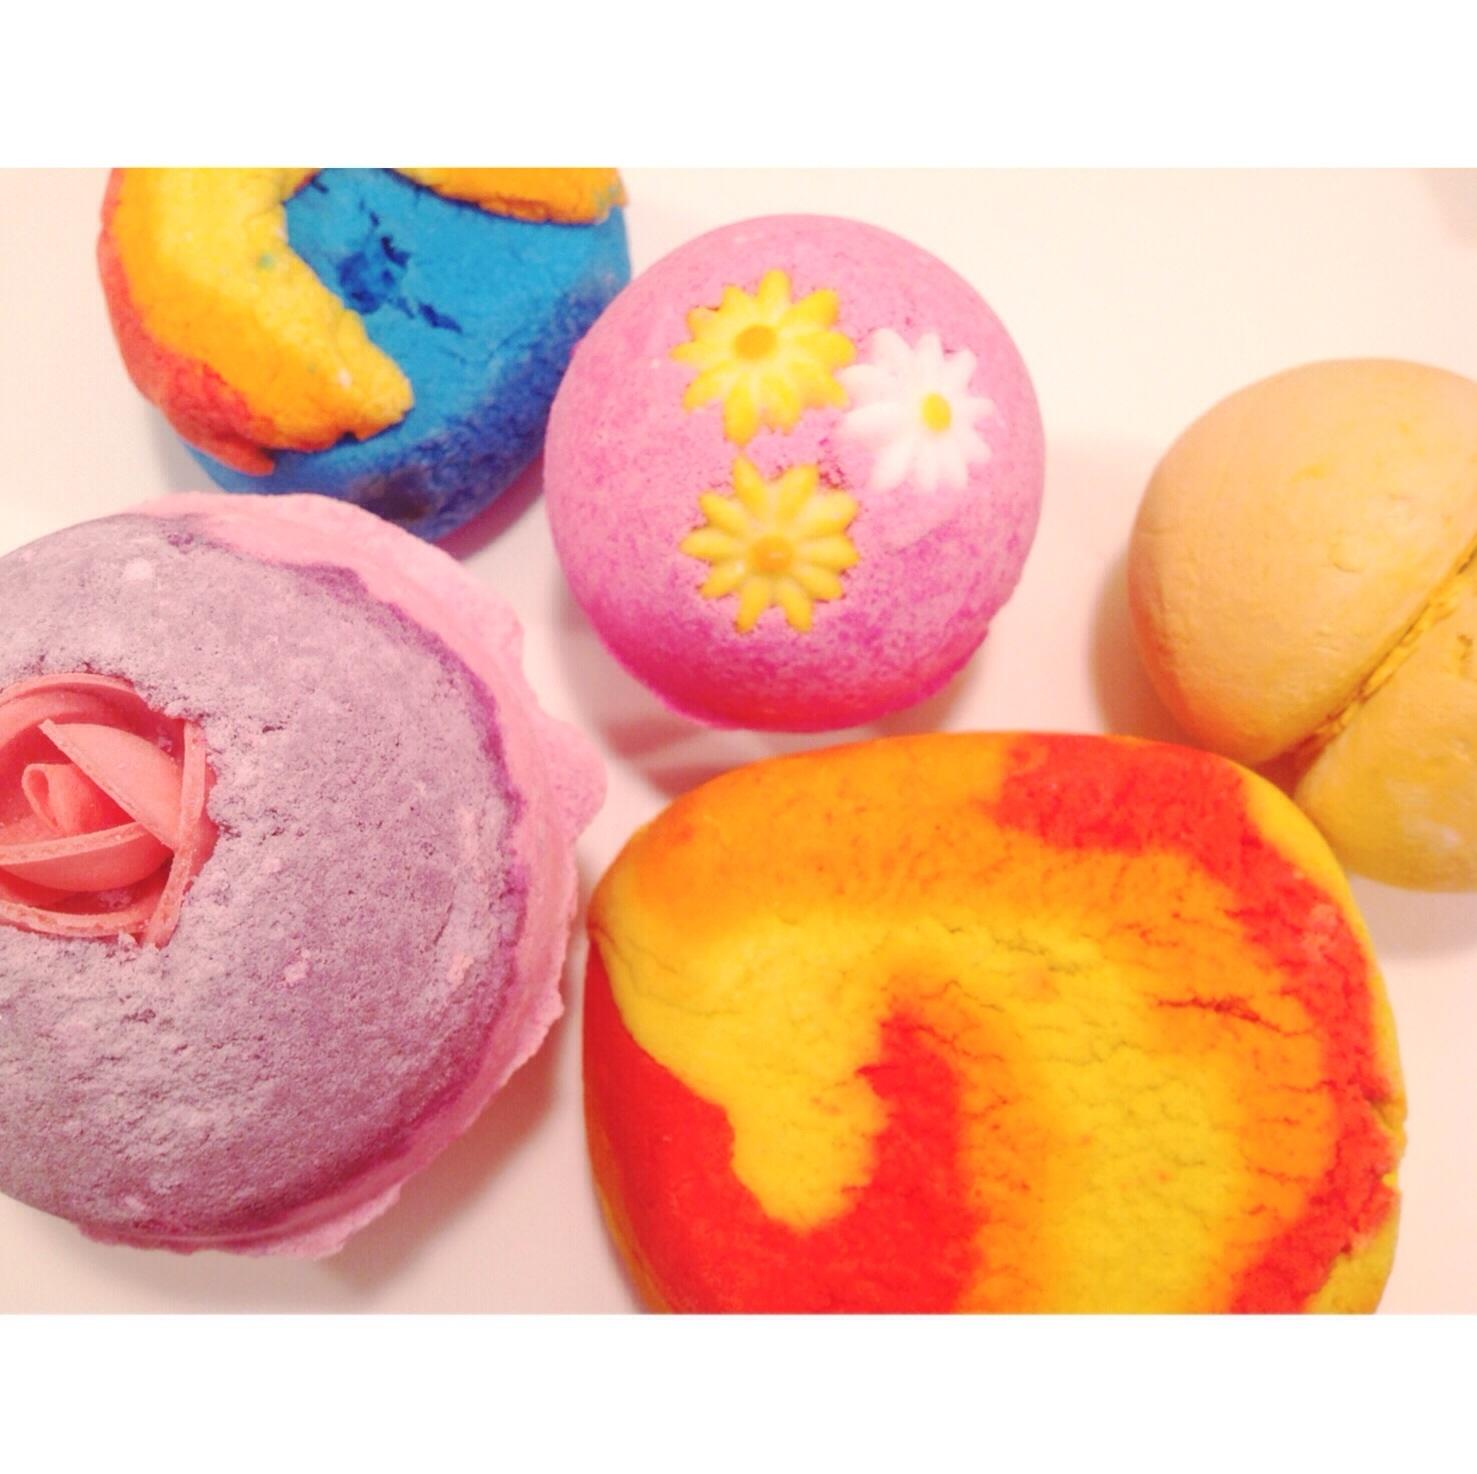 HUGE Lush Review: Face Masks, Bath Bombs, & Bubble Bars! + ...